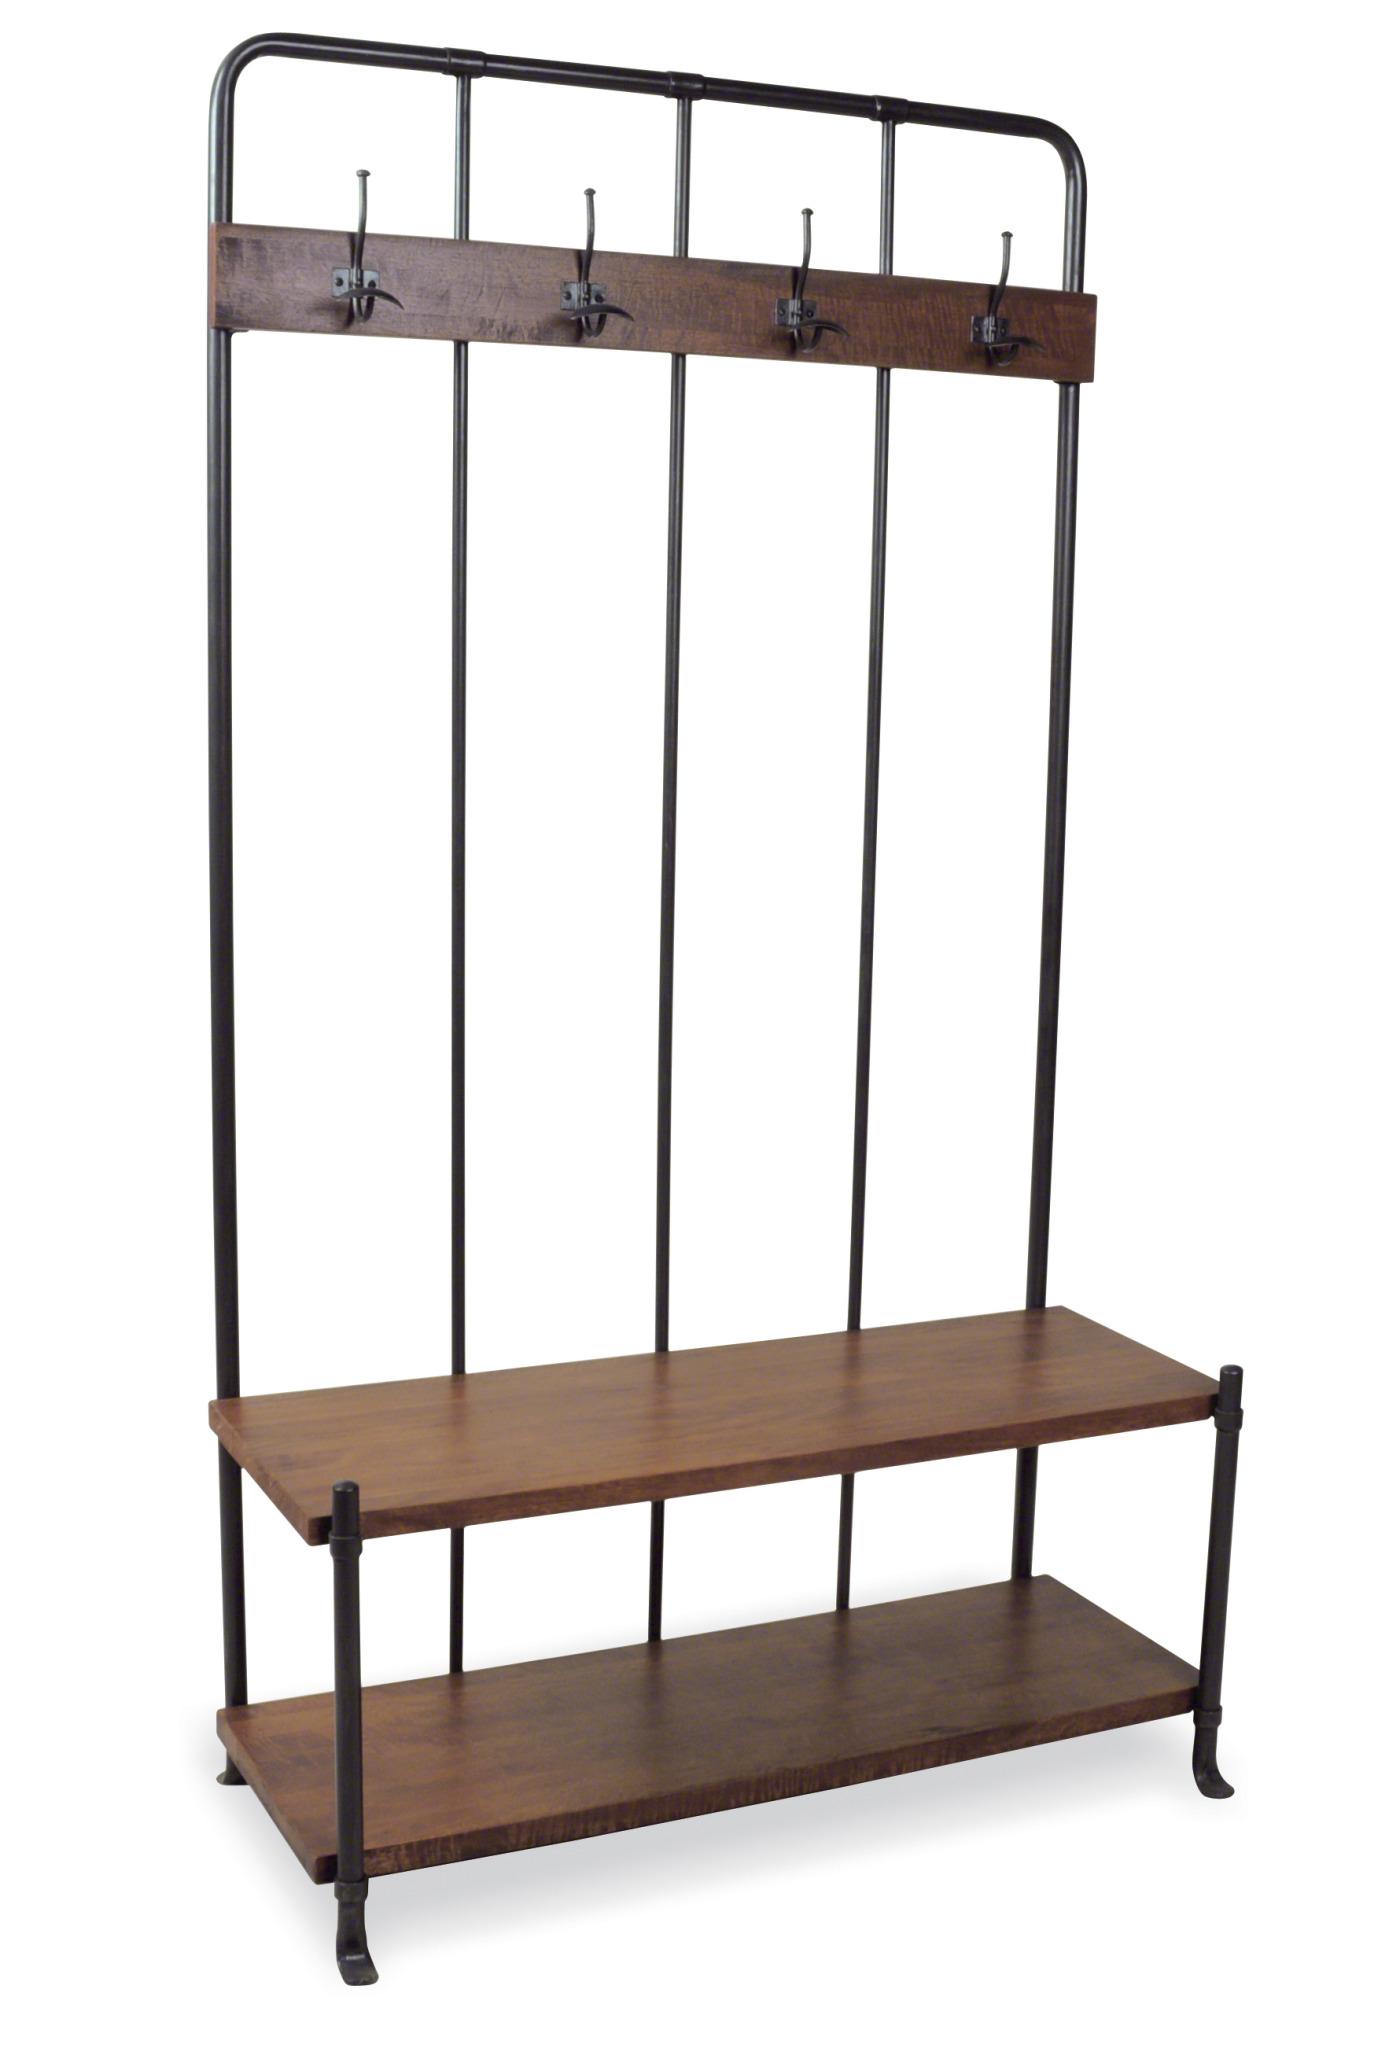 Loft Rustic Re Engineered Wooden High Hall Bench Coat Rack With Steel